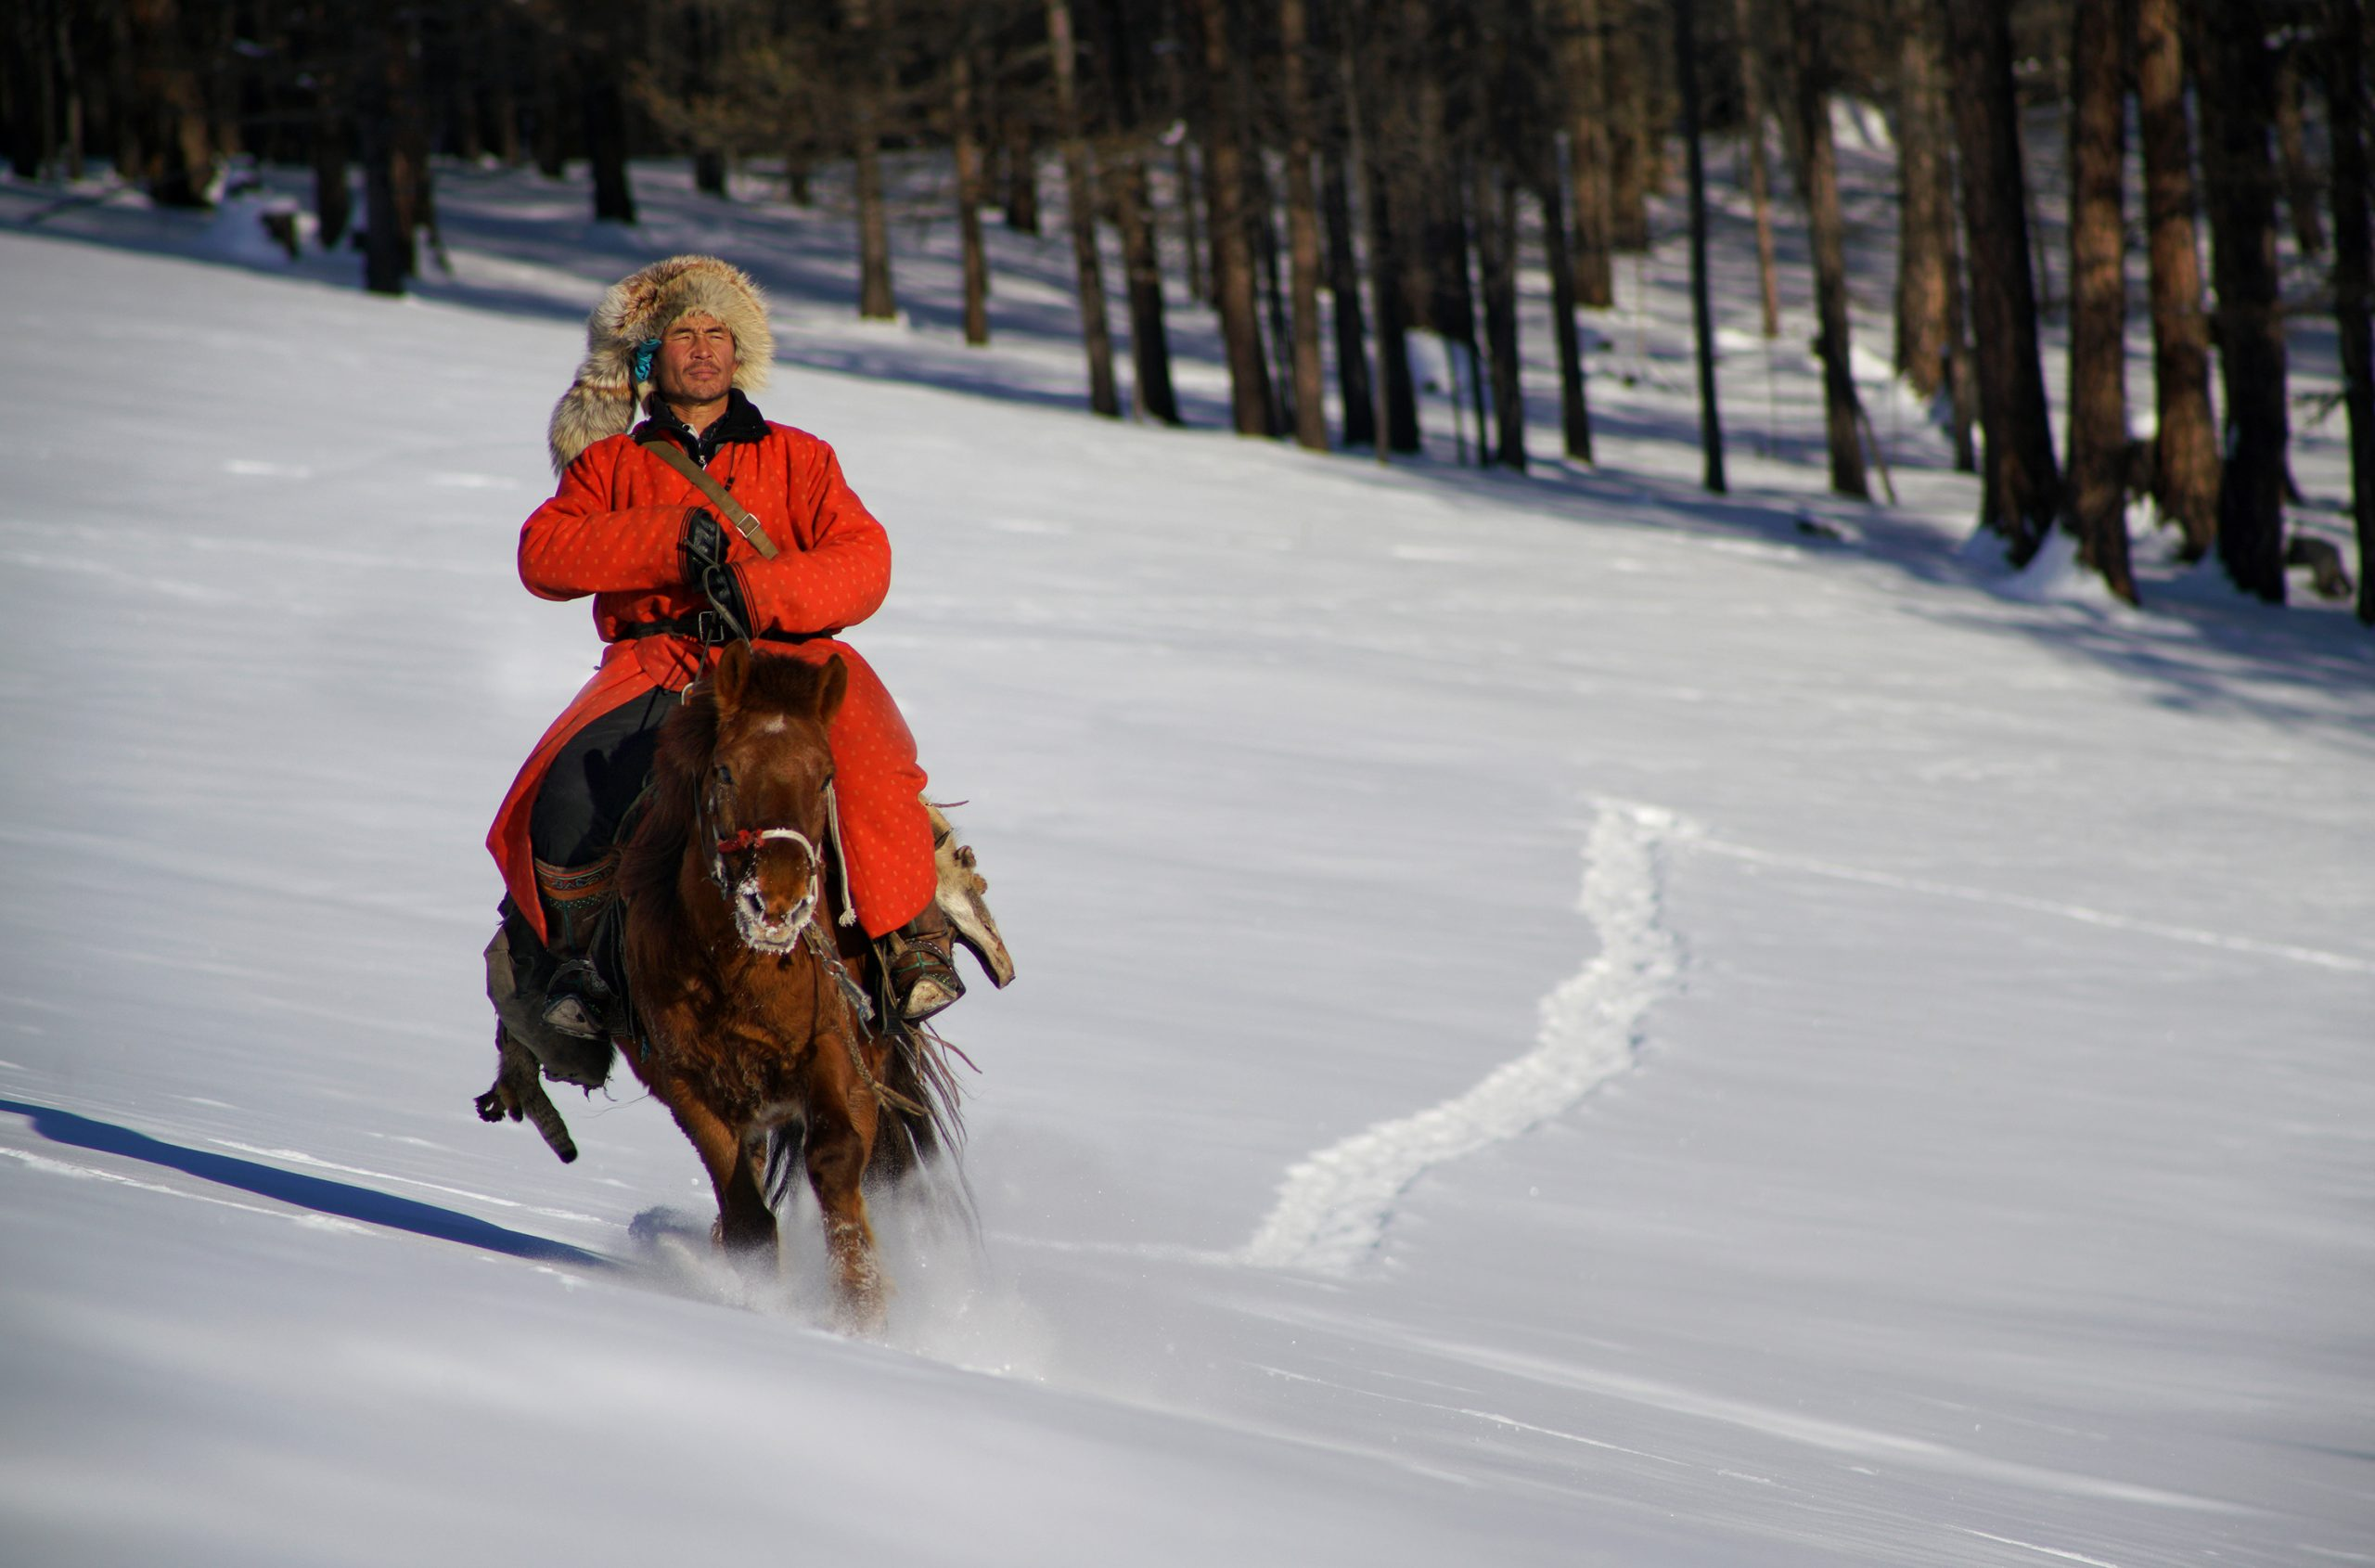 Hüter Der Mongolischen Pferde